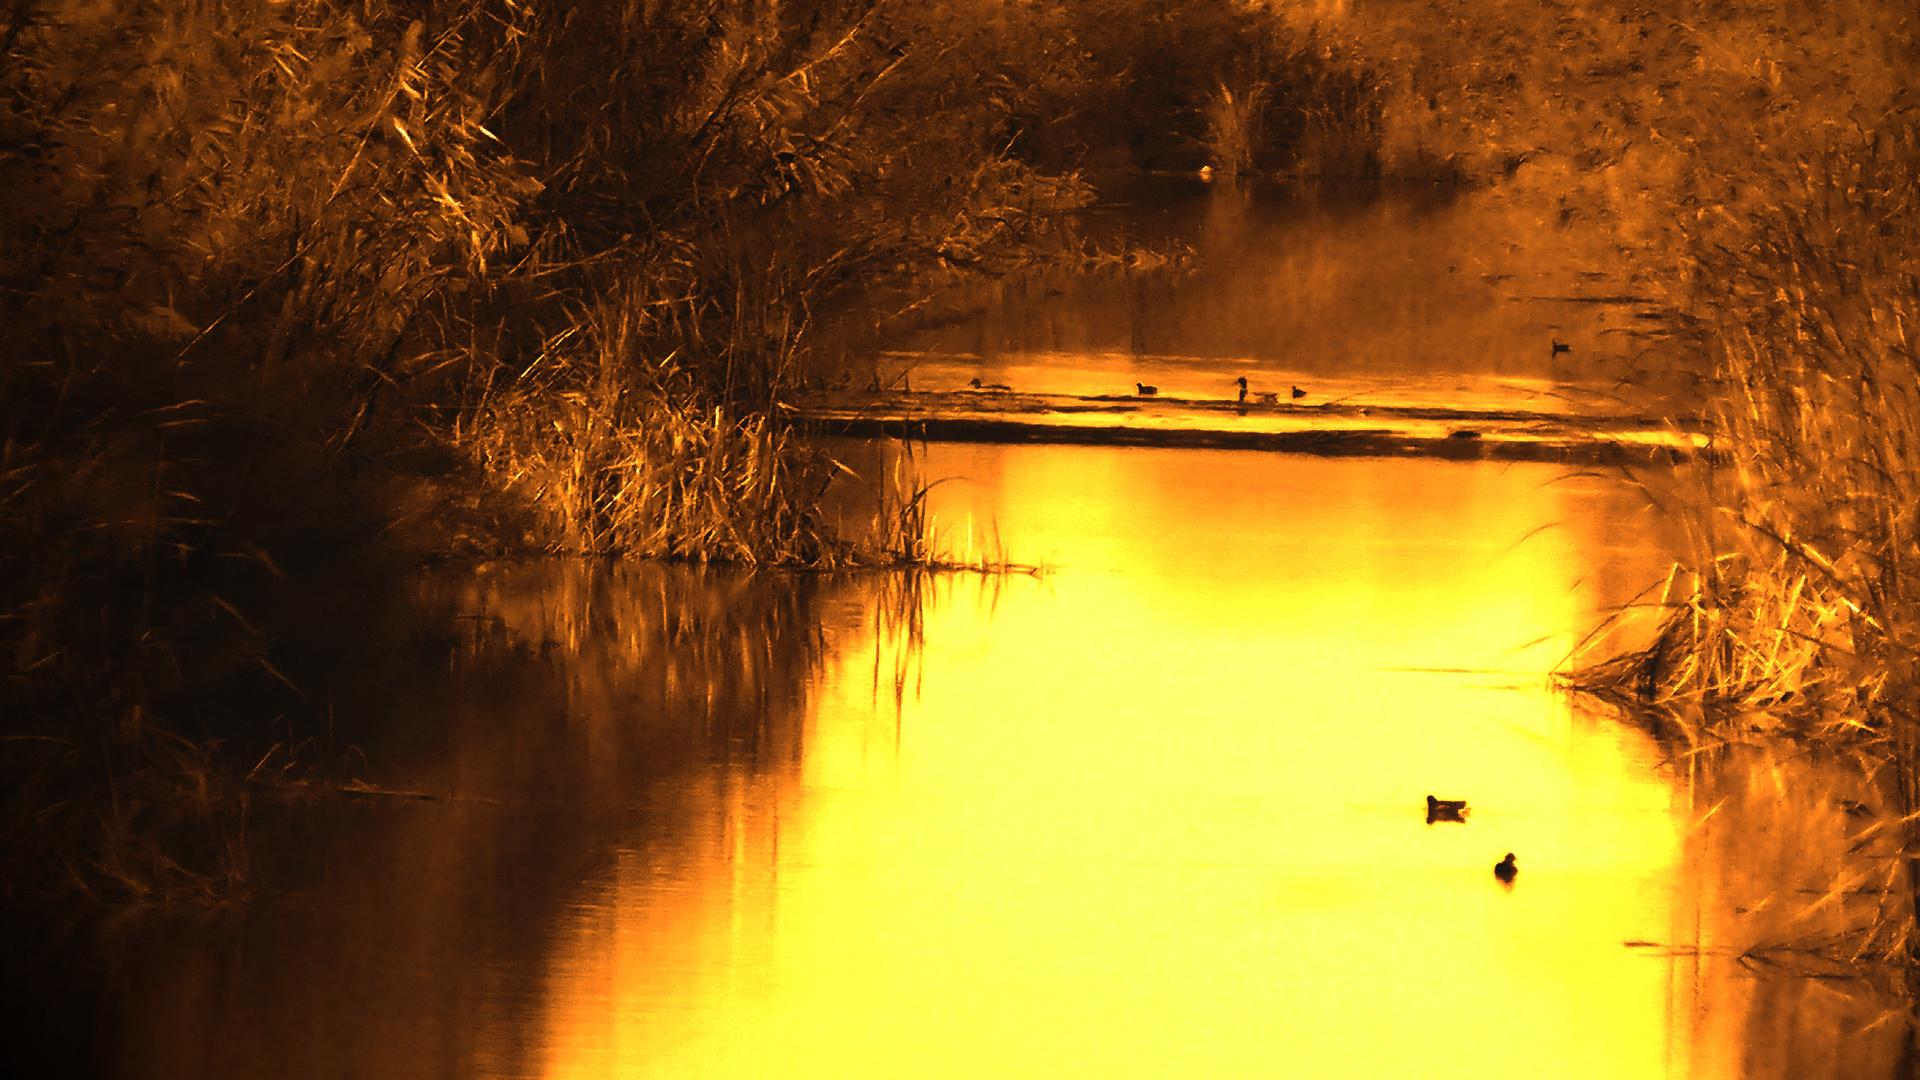 Fotos de naturaleza en HD :)